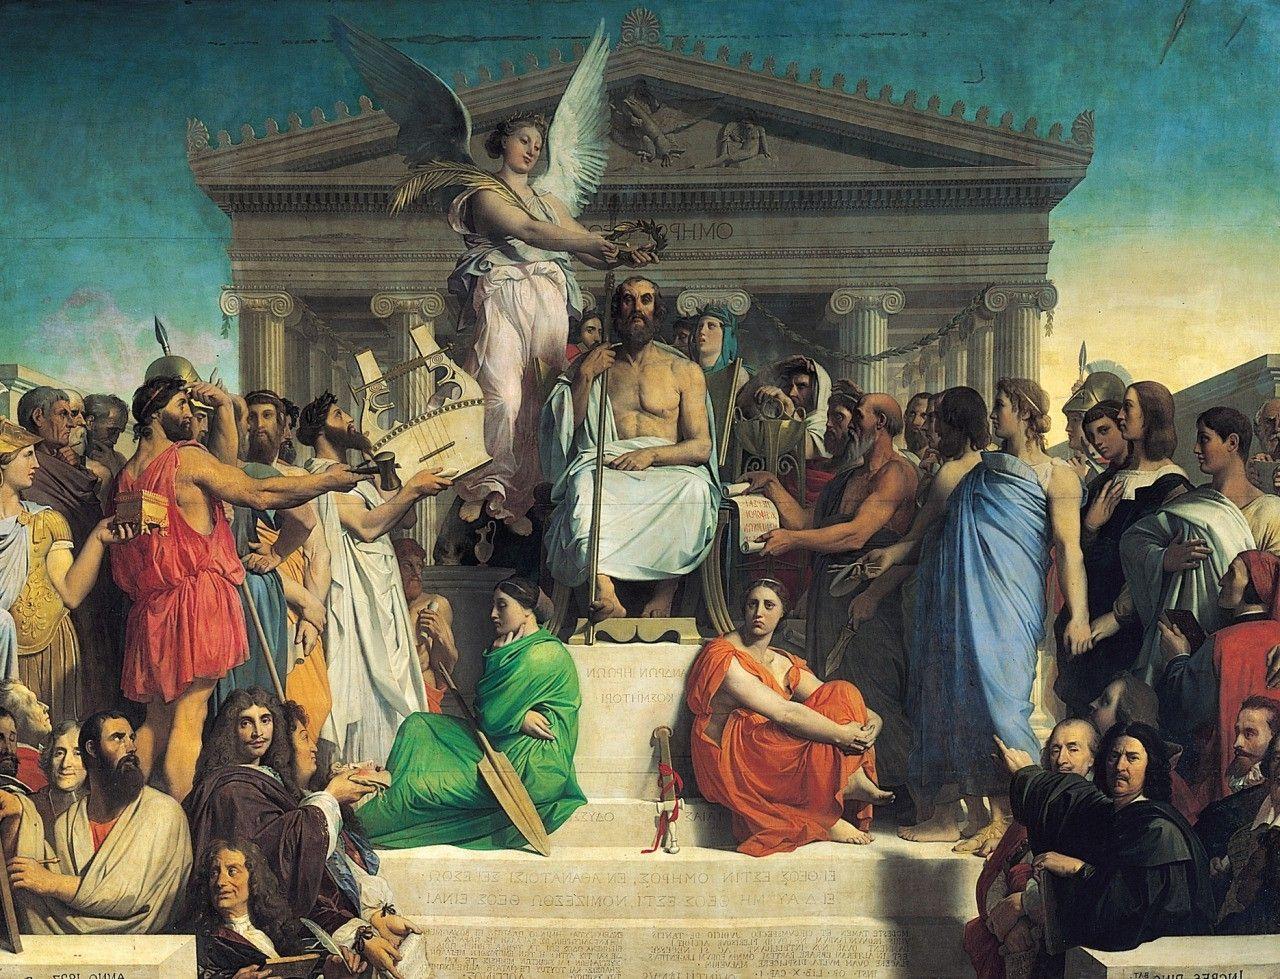 Classic Art Painting History Greek Mythology Artwork